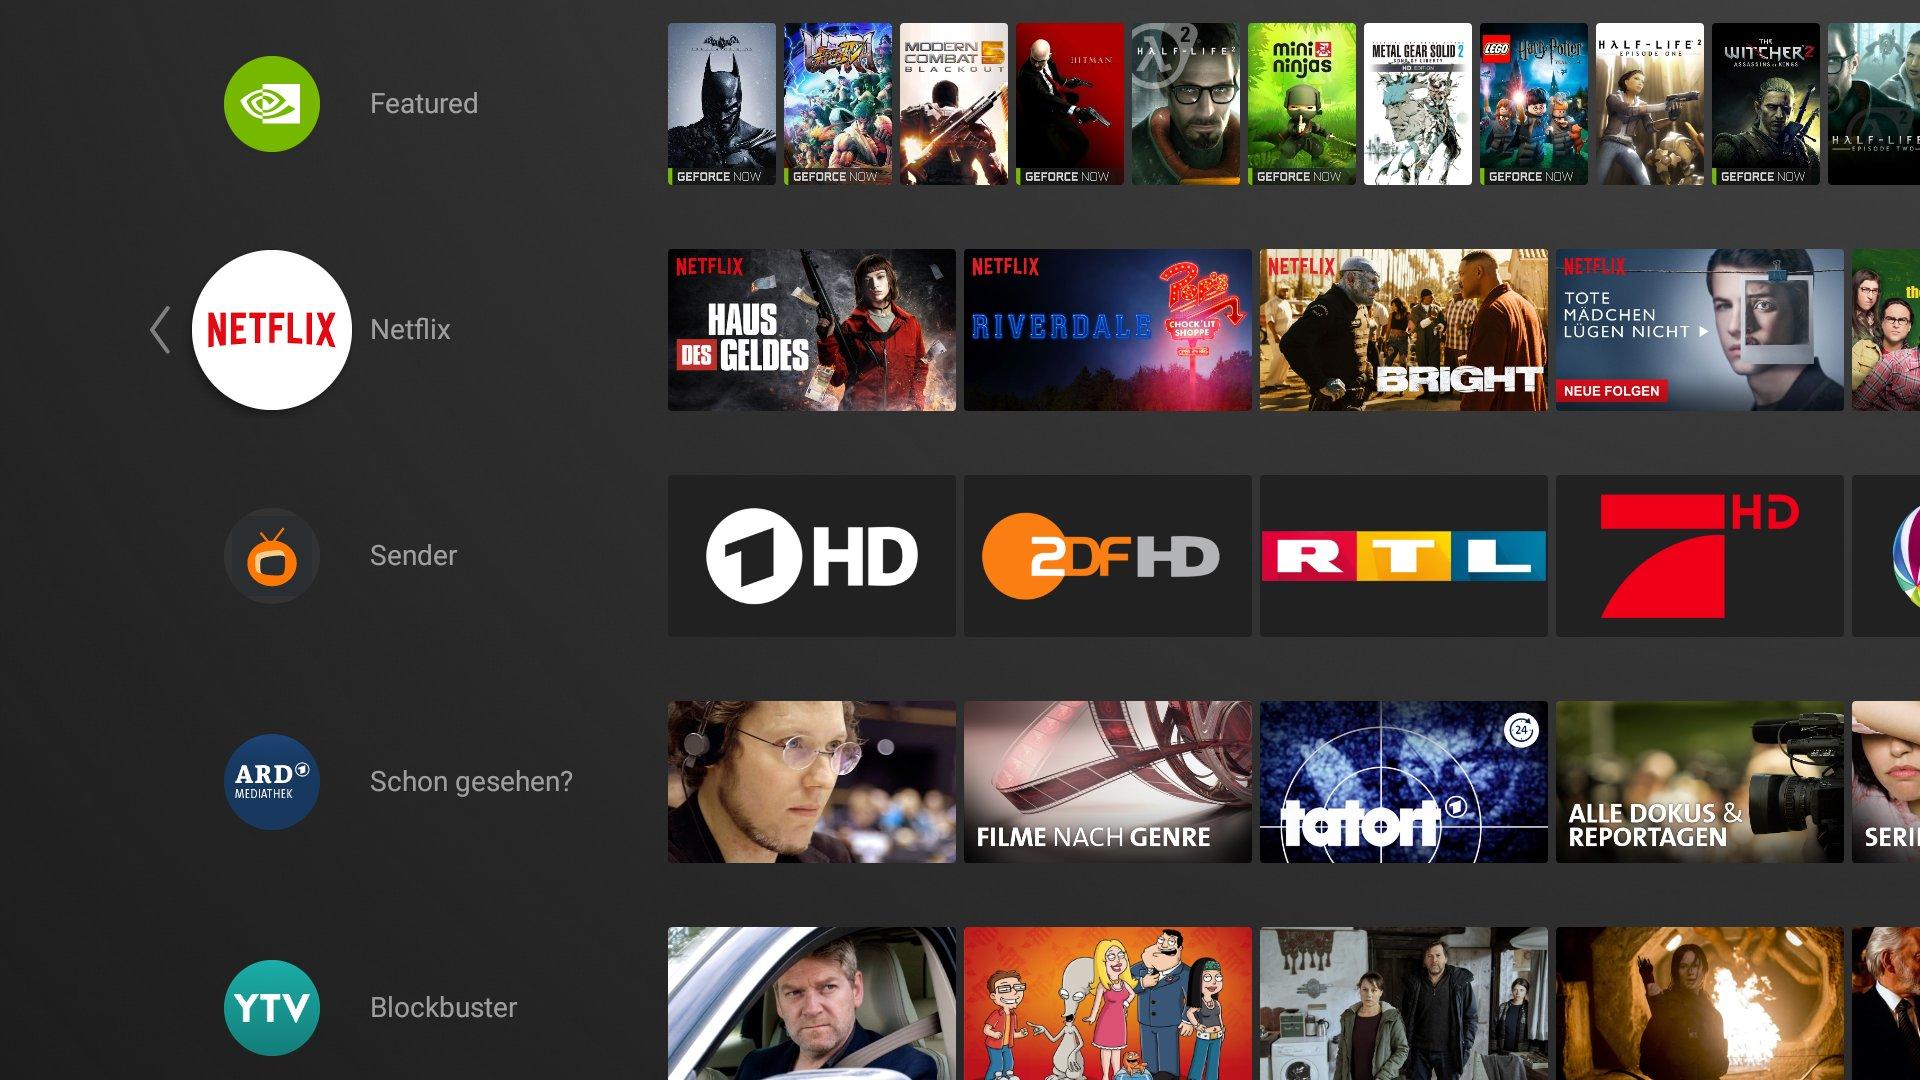 Streaming-Apps als Fernsehkanäle